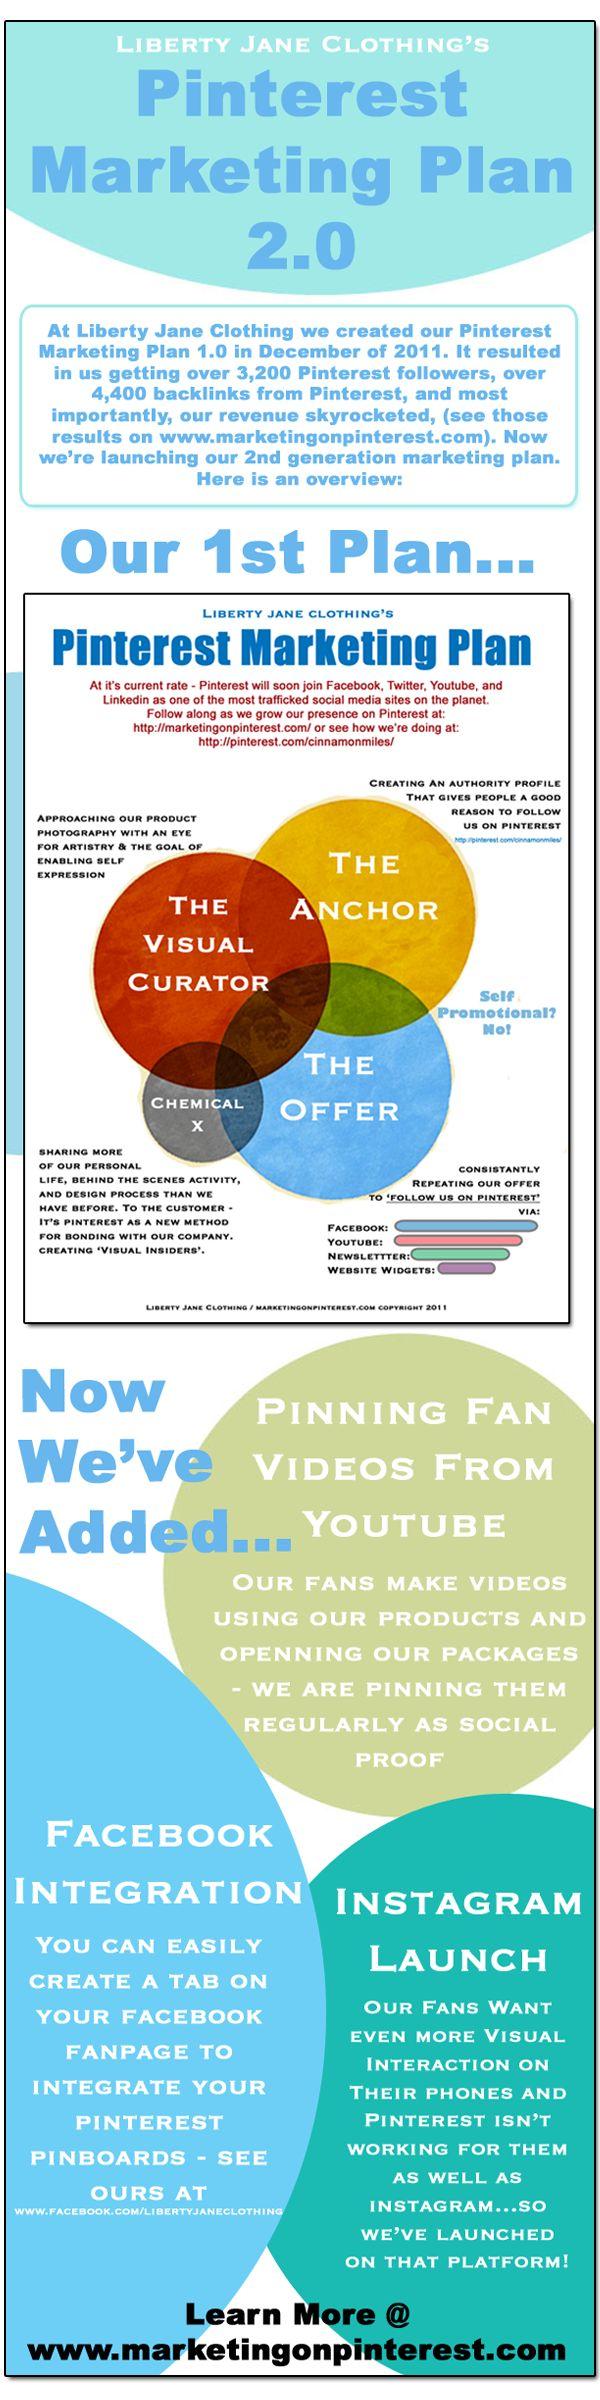 #Pinterest #Marketing Plan 2.0 [Infographic]